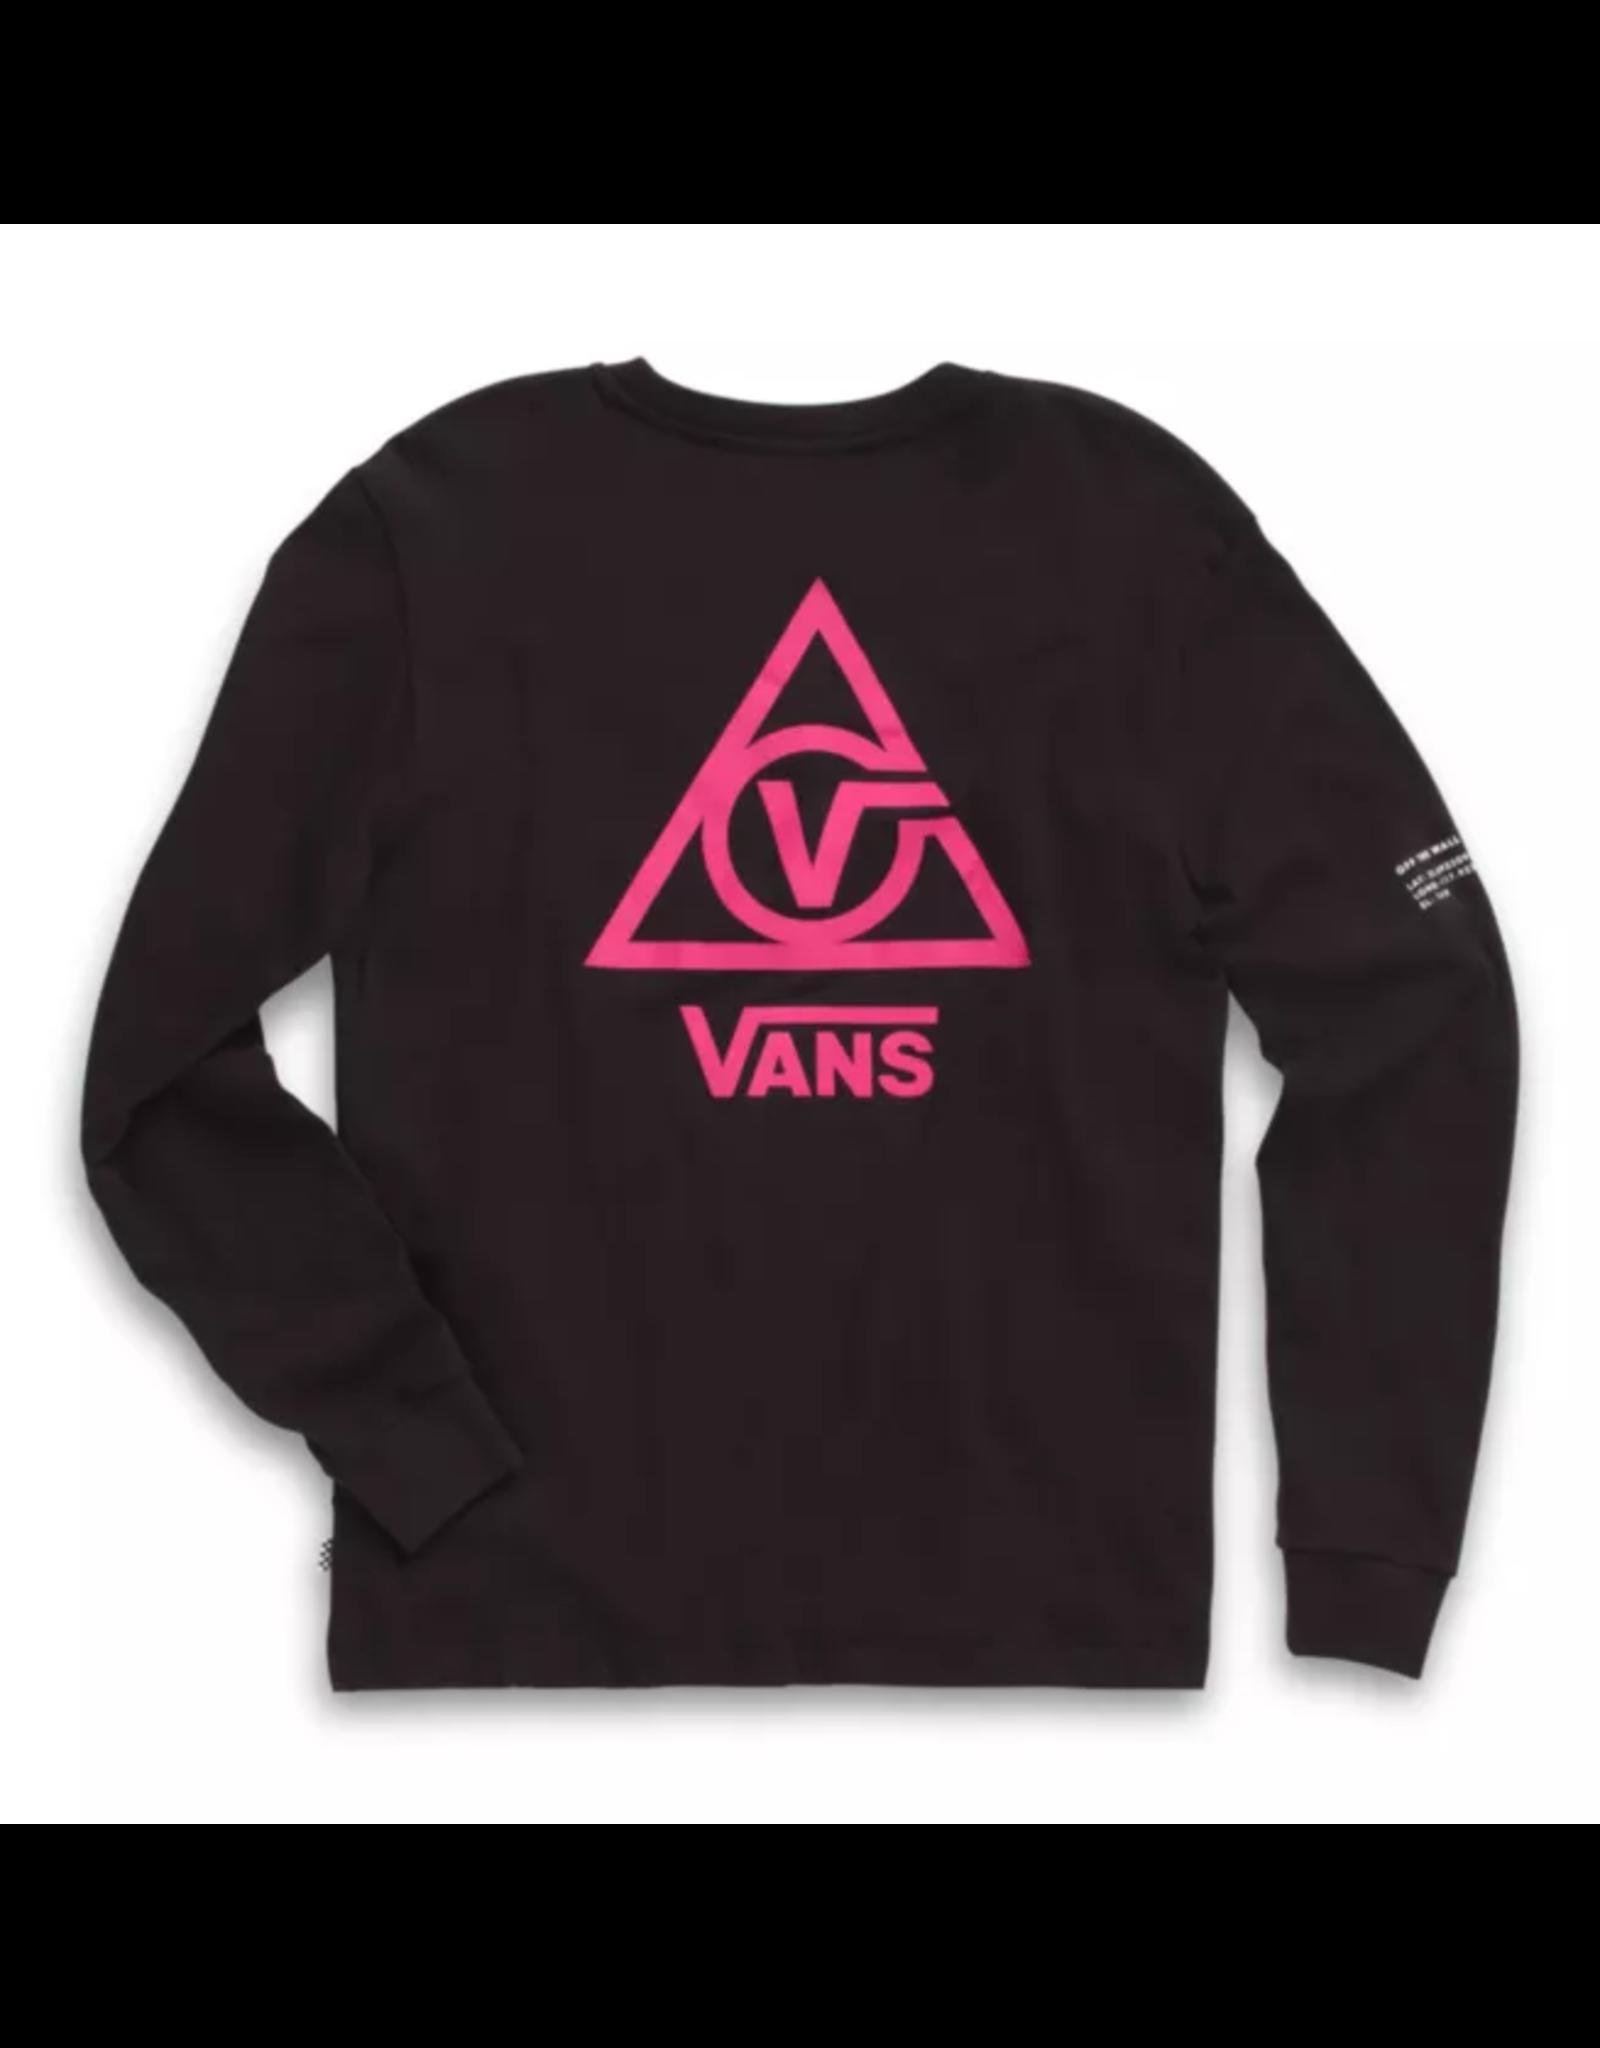 vans Vans - Chandail long femme 66 supply black